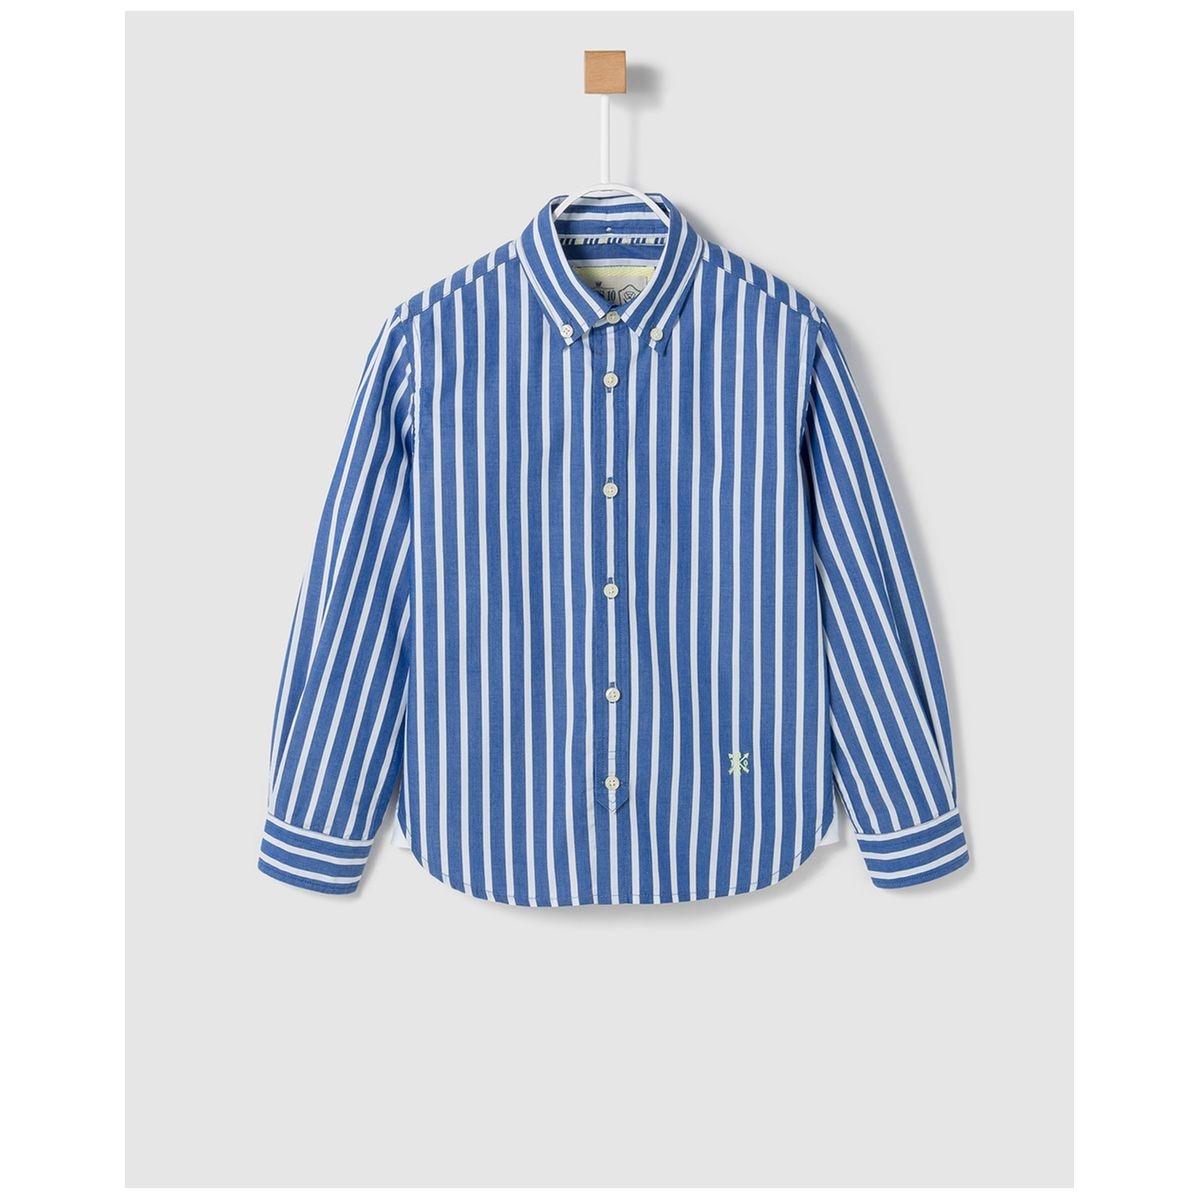 Chemise à motife